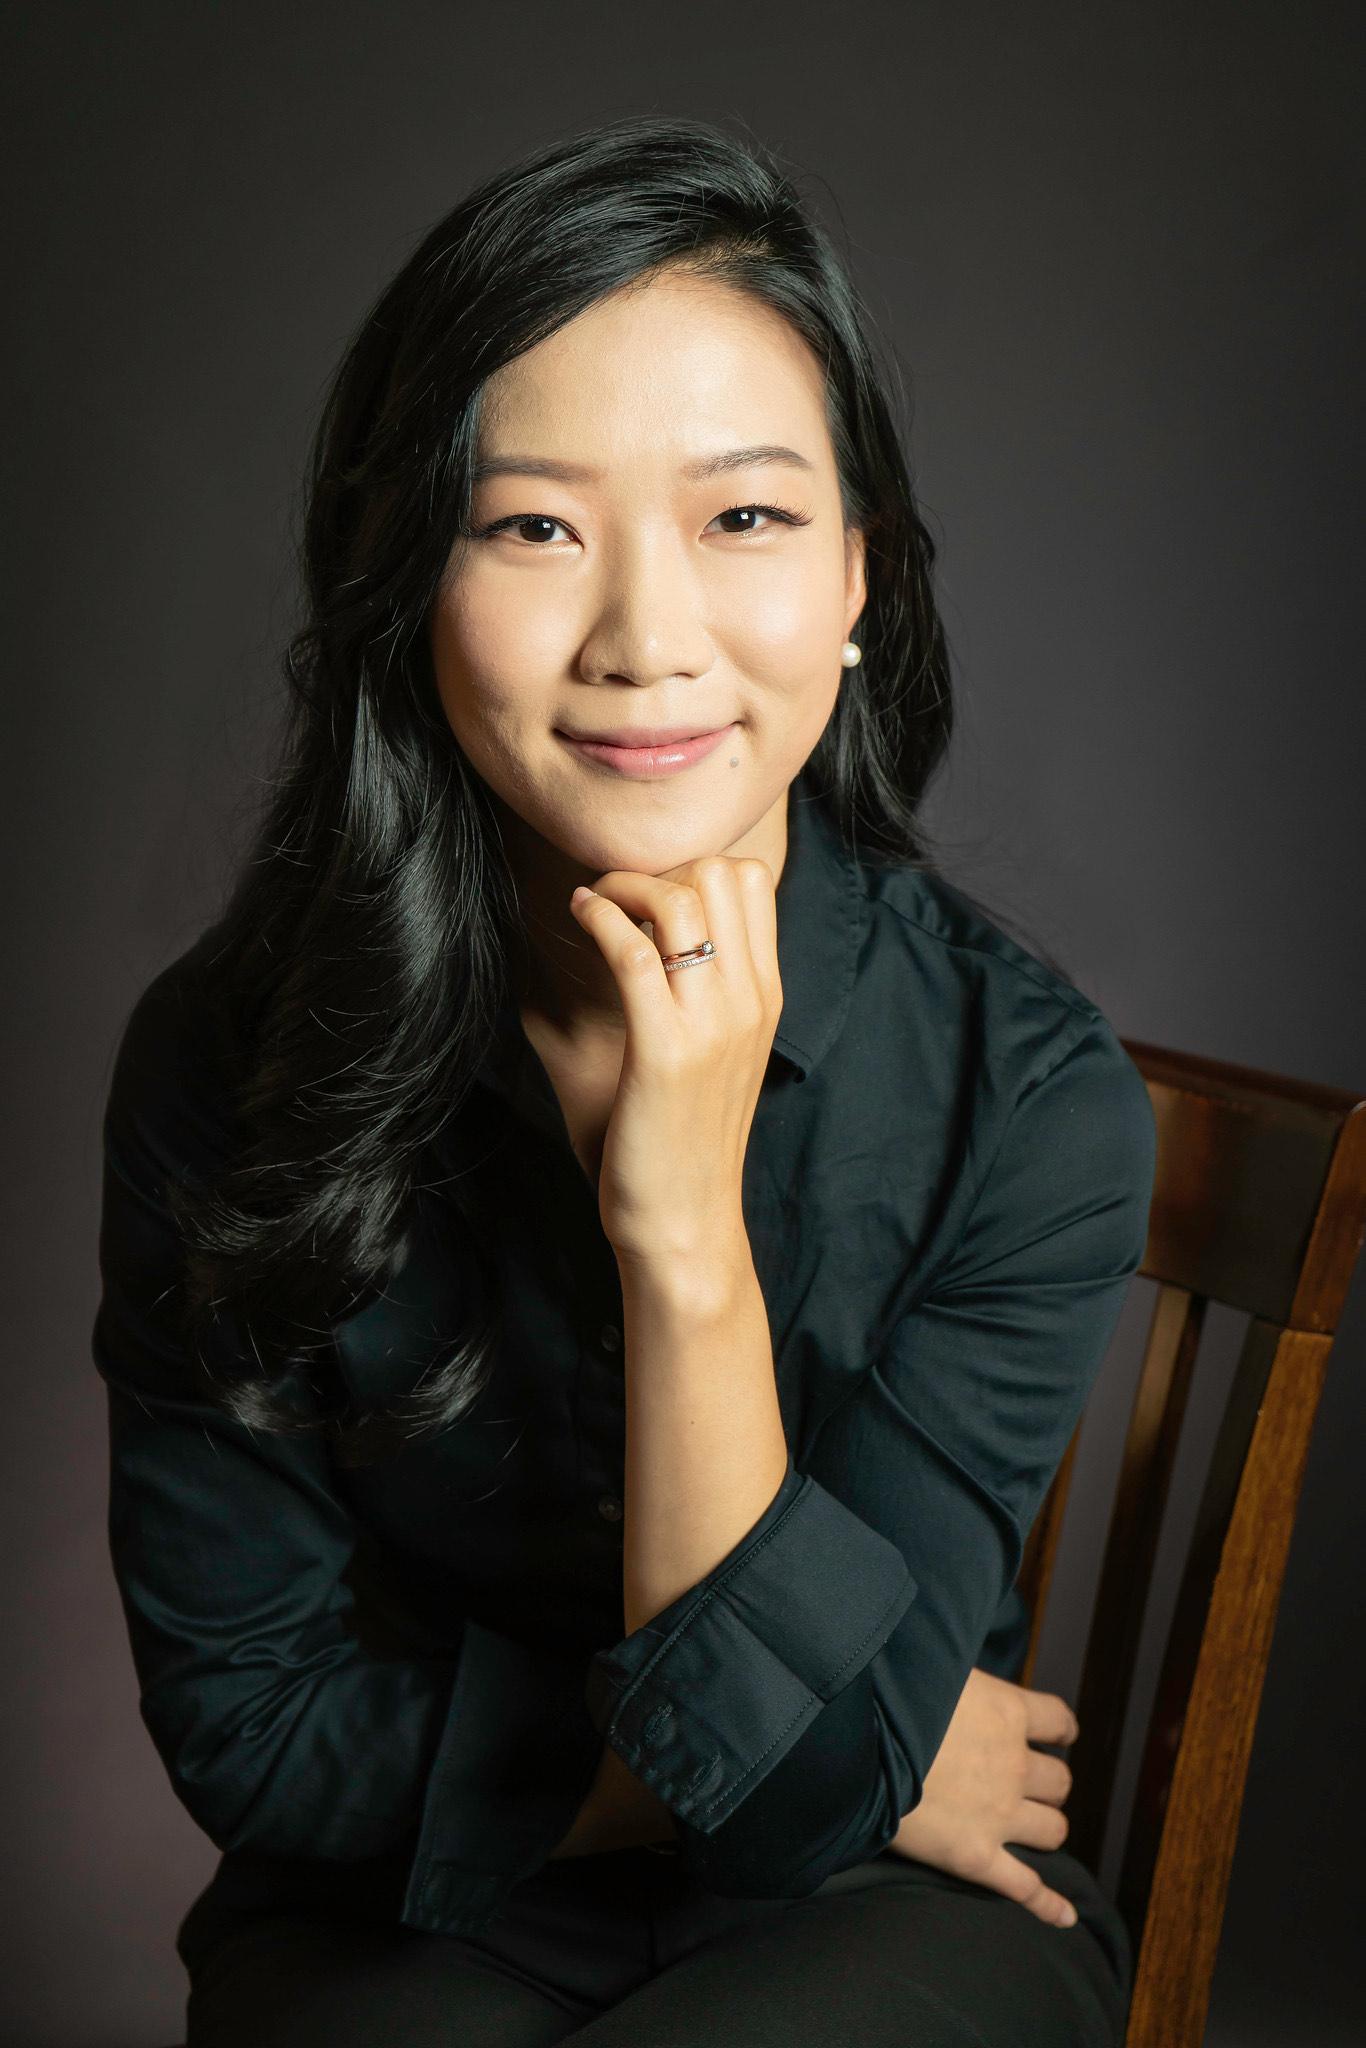 Bin Yu Sanford